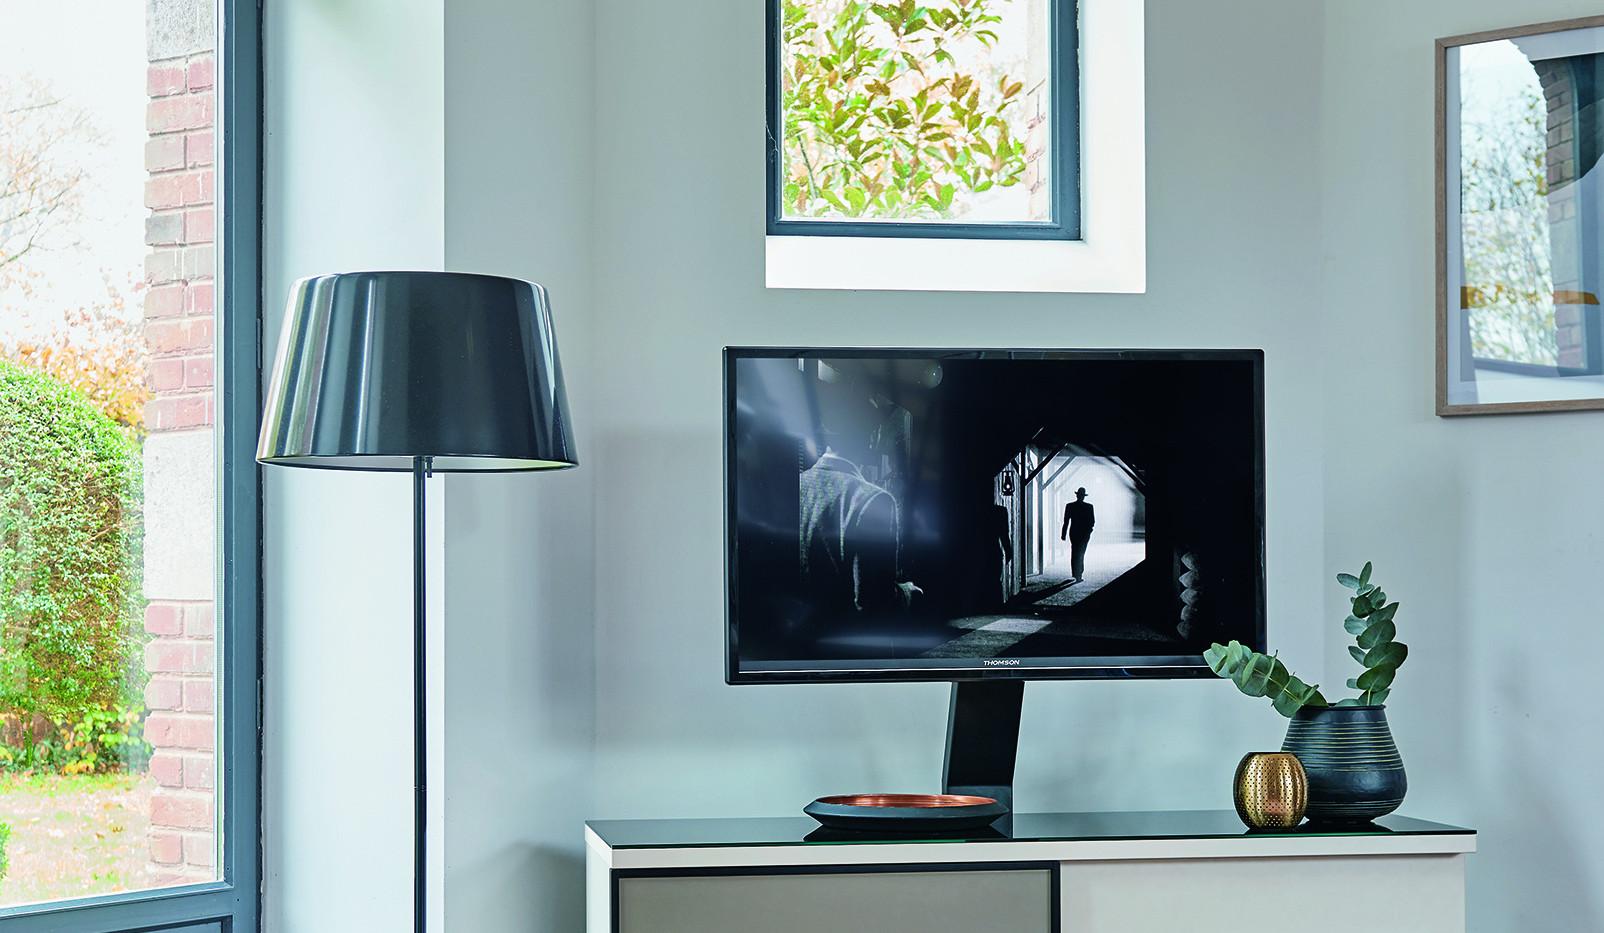 meuble-tv-cachemire-ambiance.jpg